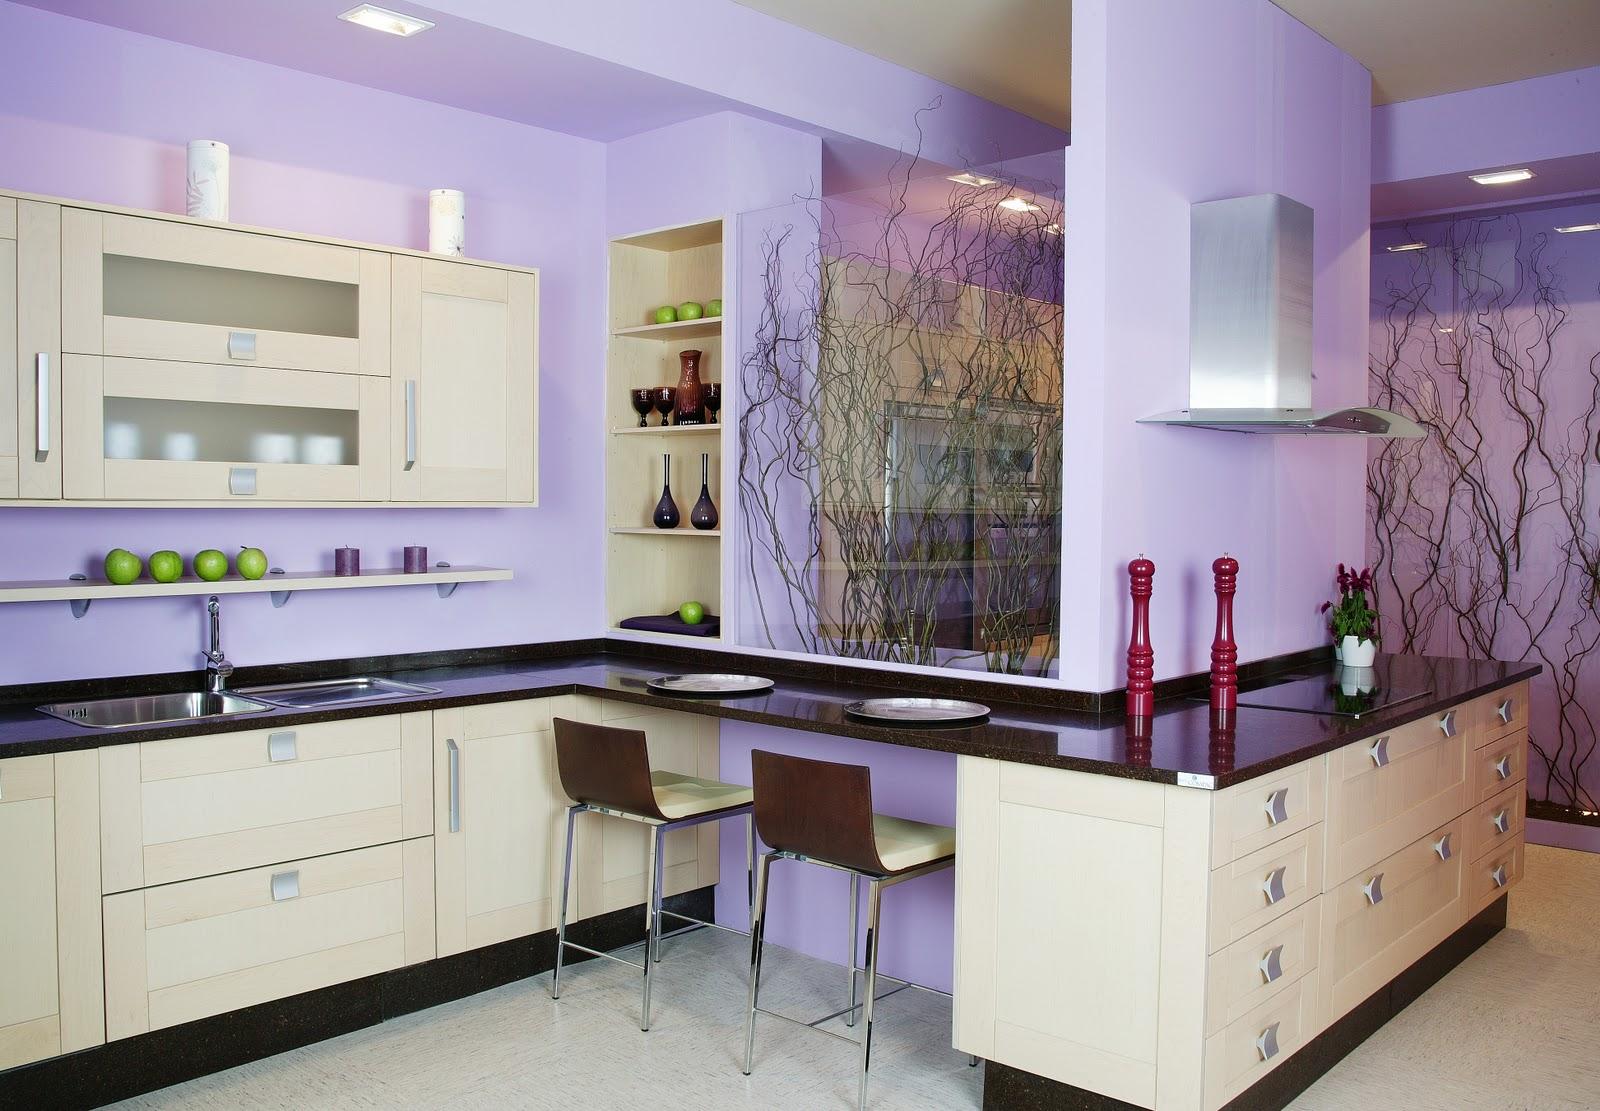 Dise a tu cocina como tener una cocina mas comoda for Disena tu cocina online